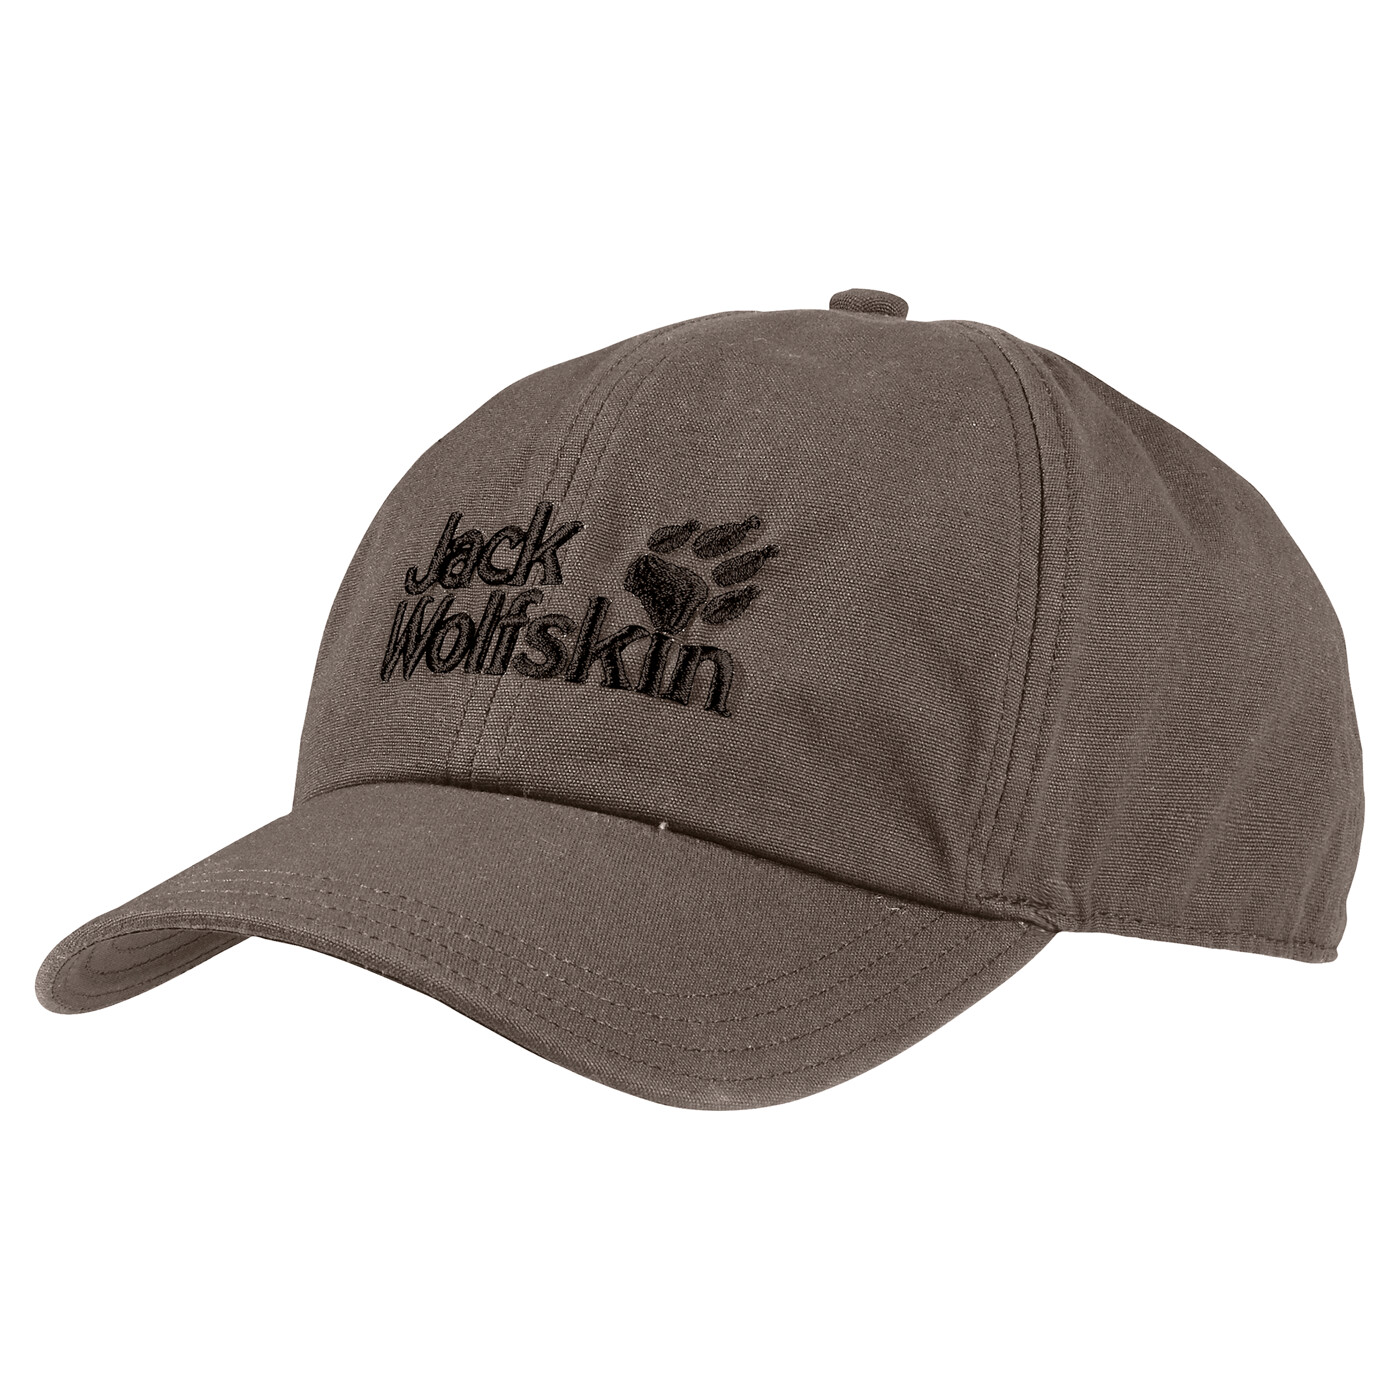 JACK-WOLFSKIN BASEBALL CAP - Herren